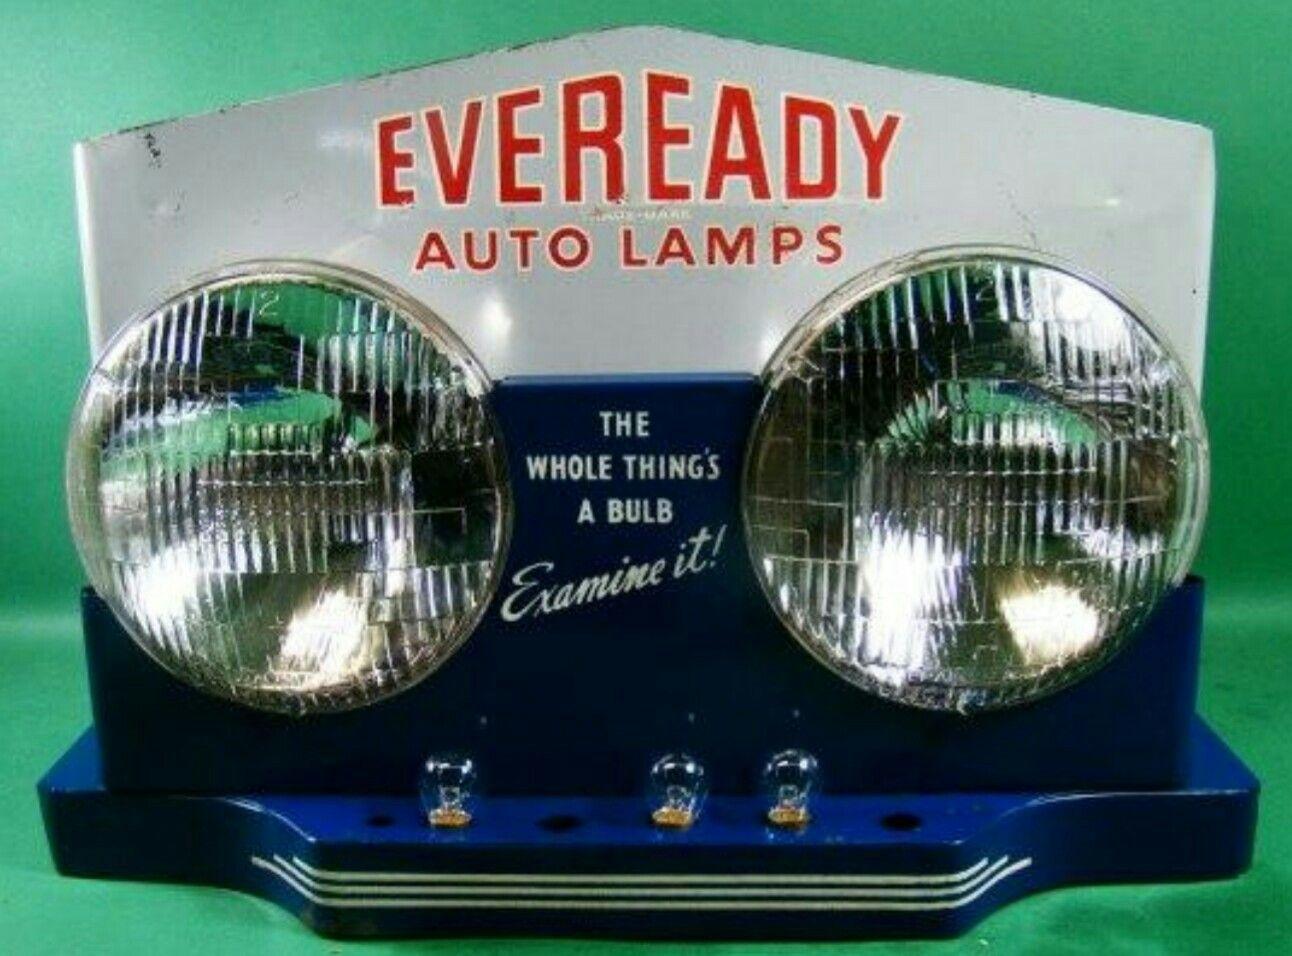 Original Eveready Auto Bulbs Advertising Display Vintage Oil Cans Vintage Sales Online Vintage